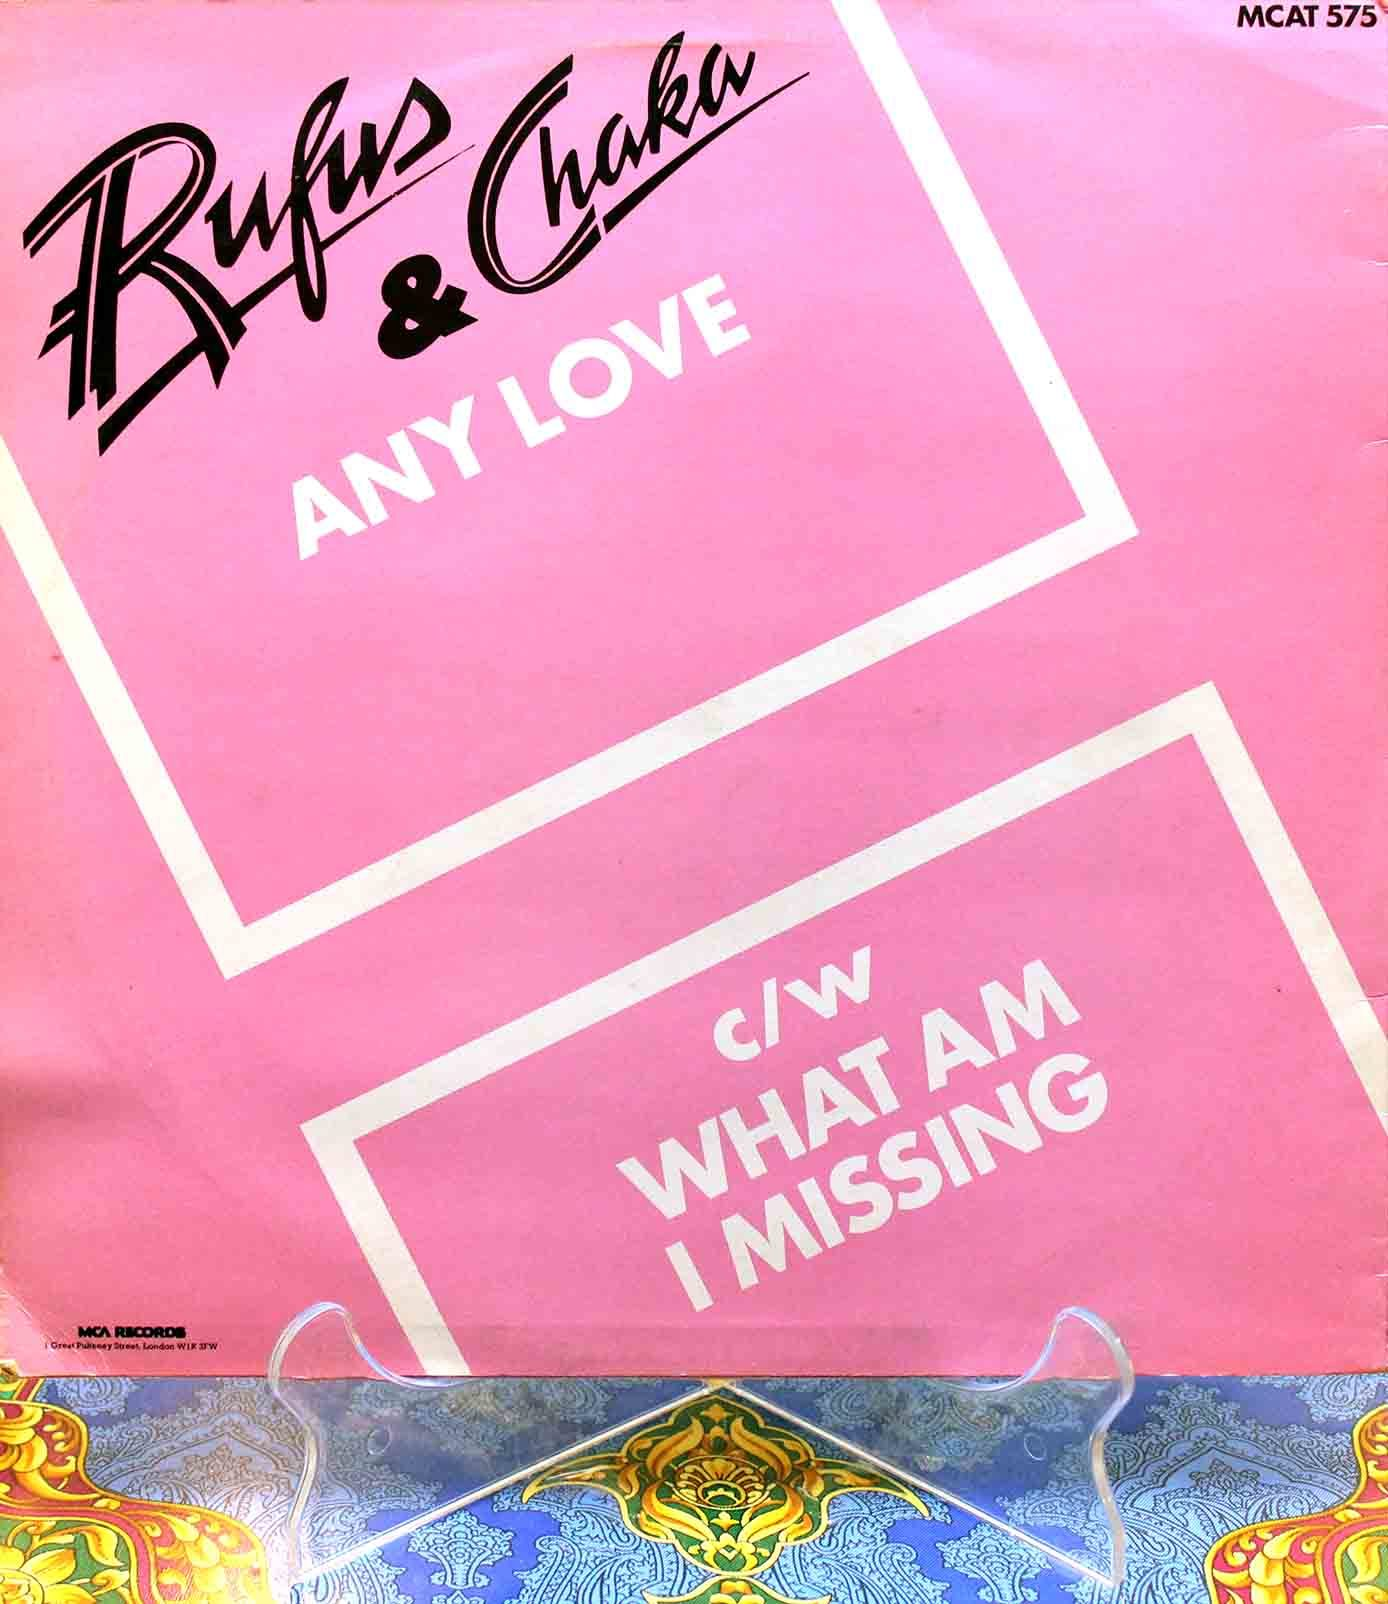 Rufus Chaka Any Love 02